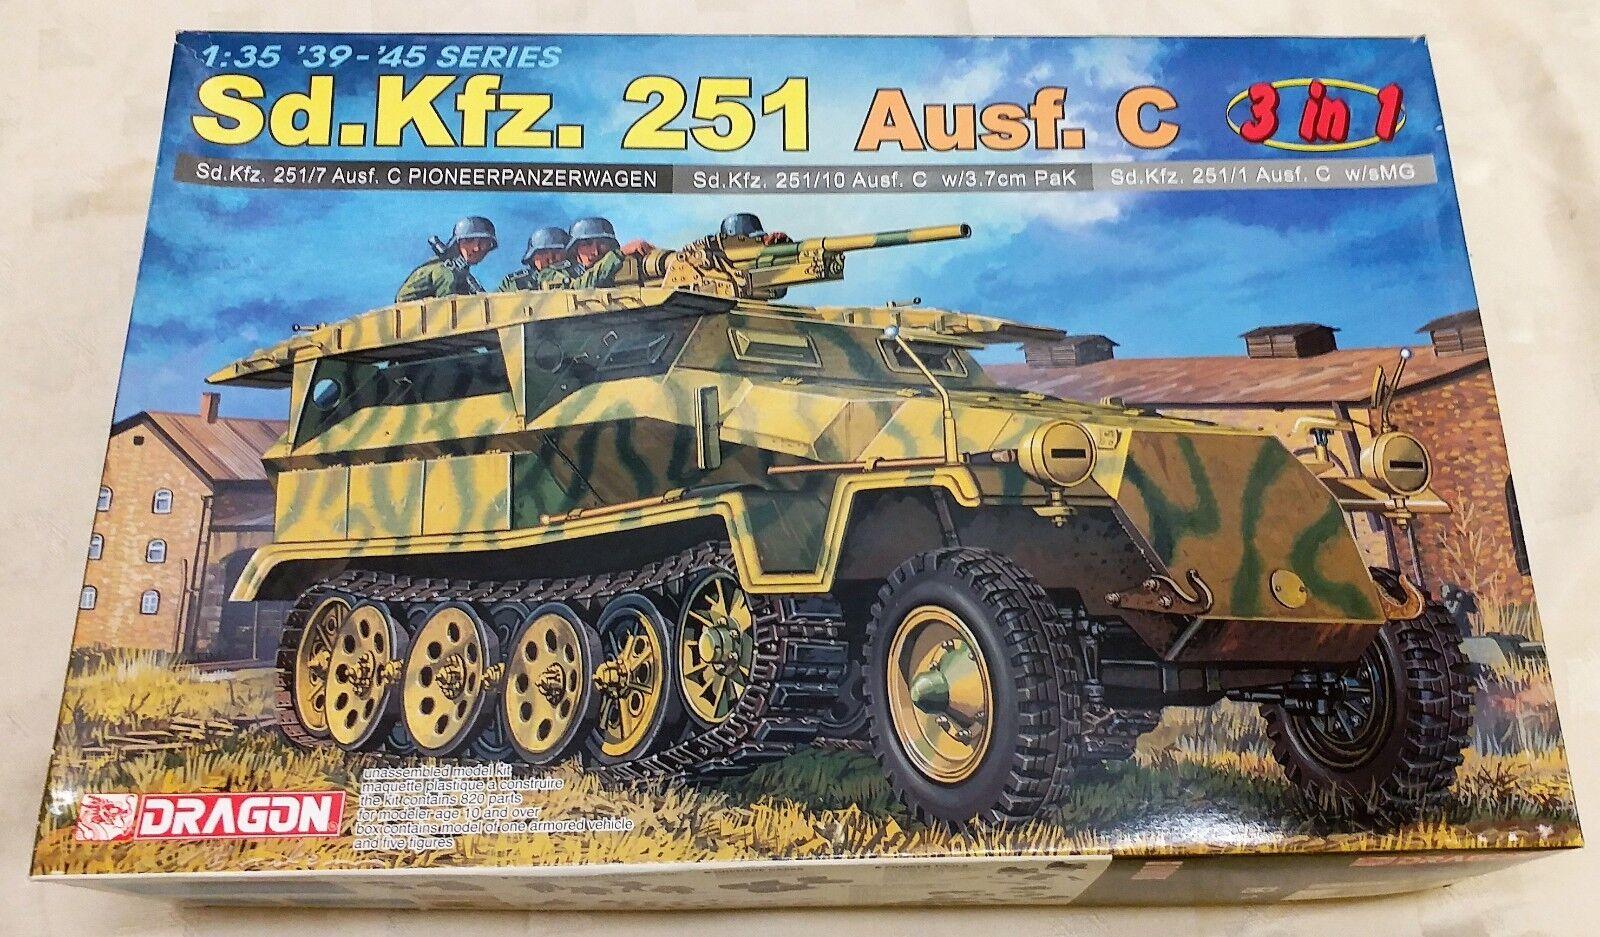 DRAGON 1 35 Sd.Kfz.251 Ausf.C 3-in-1 Model Kit 6224  1  7 Pioneerpanzerwagen  10